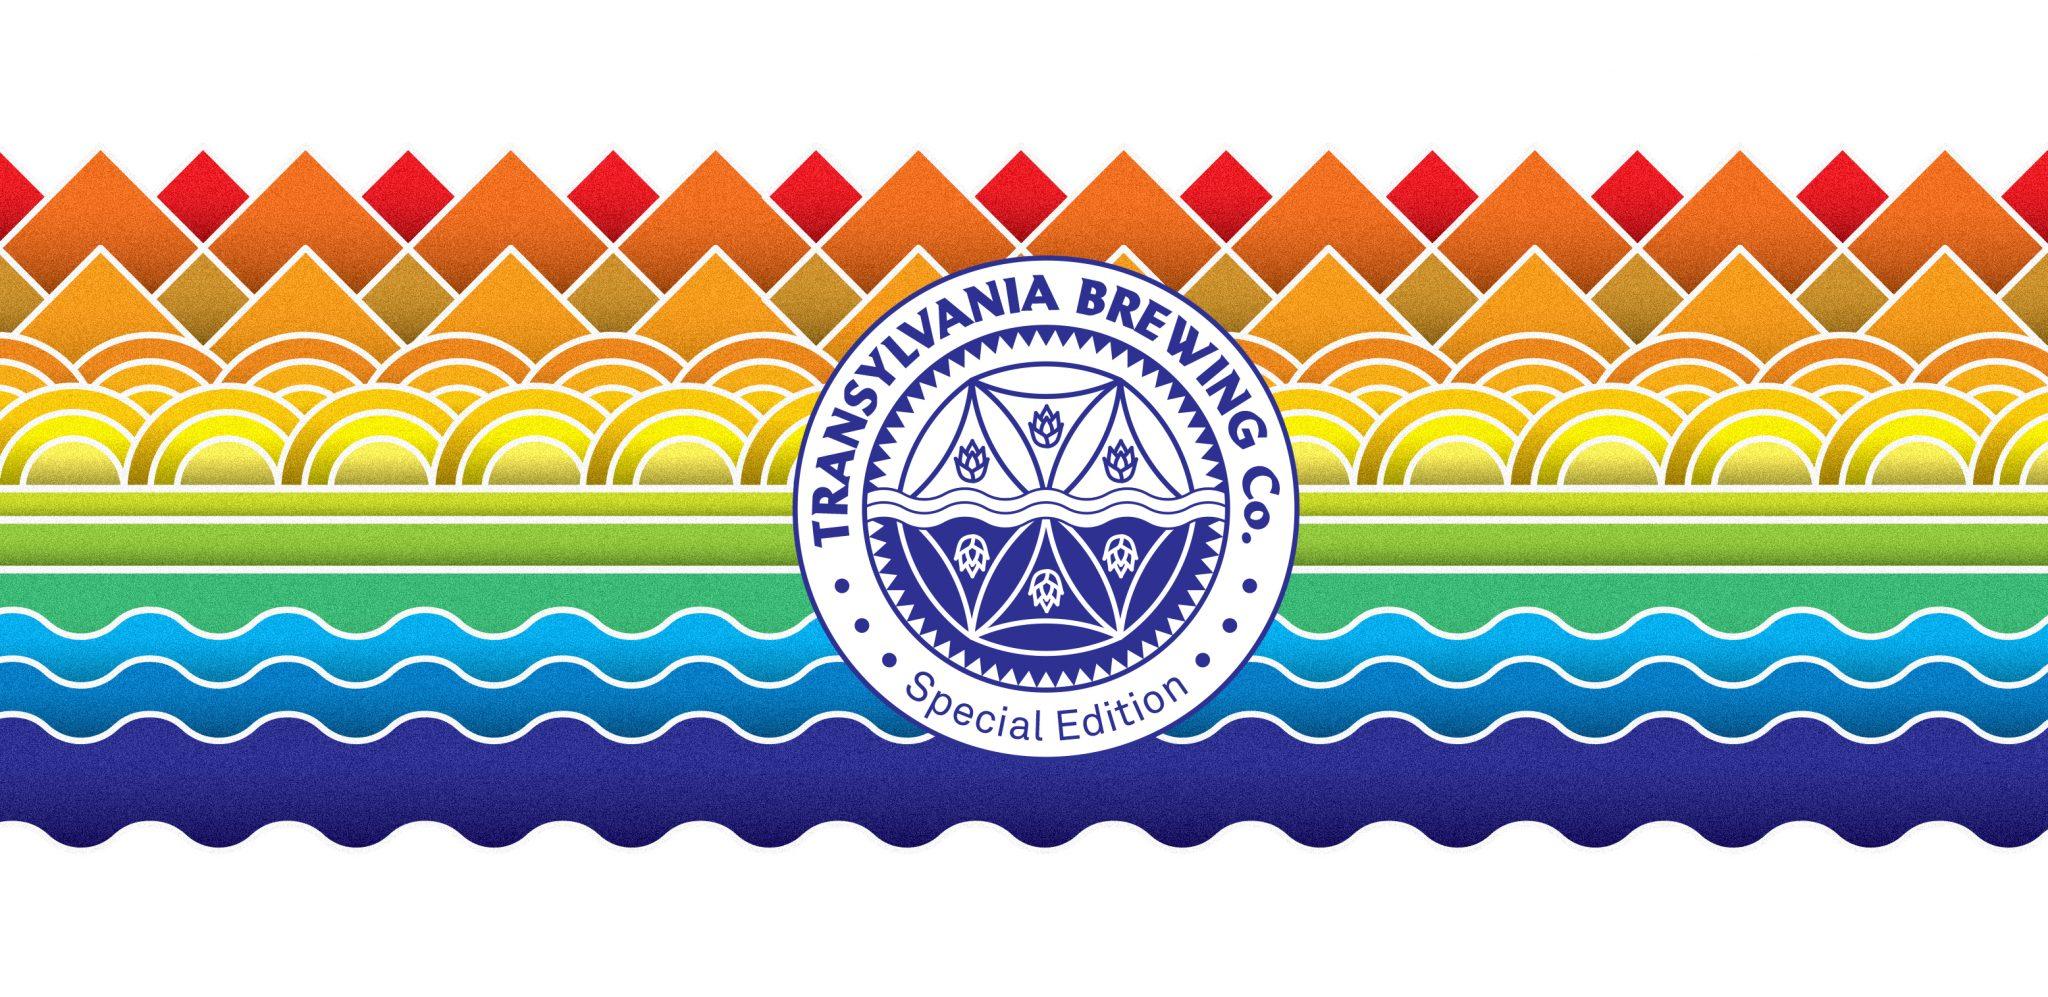 Transylvania Brewing Co. TM /